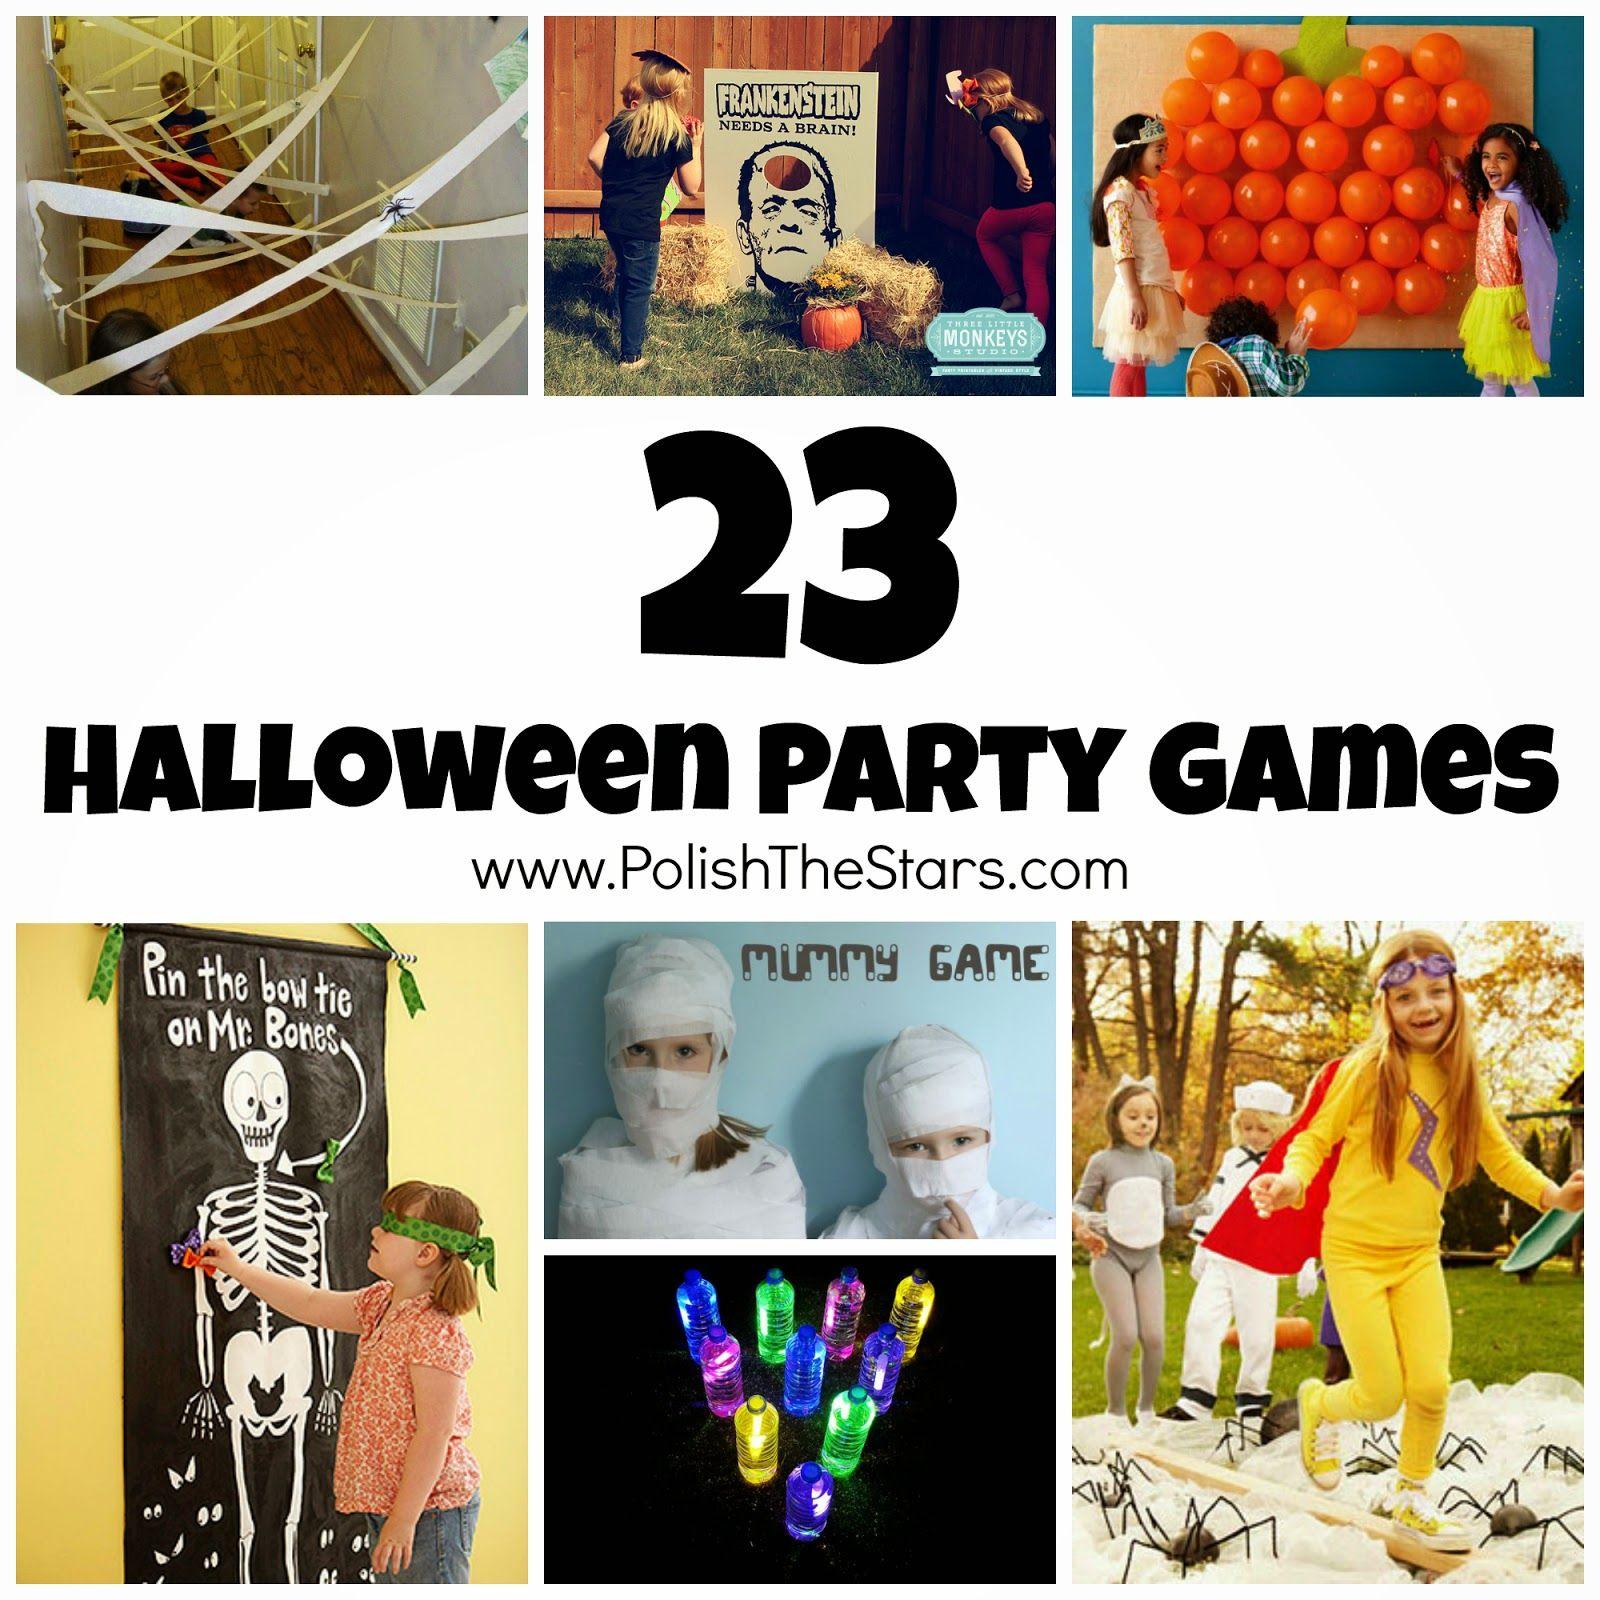 Polish The Stars: 23 Halloween Party Games | Halloween | Pinterest ...